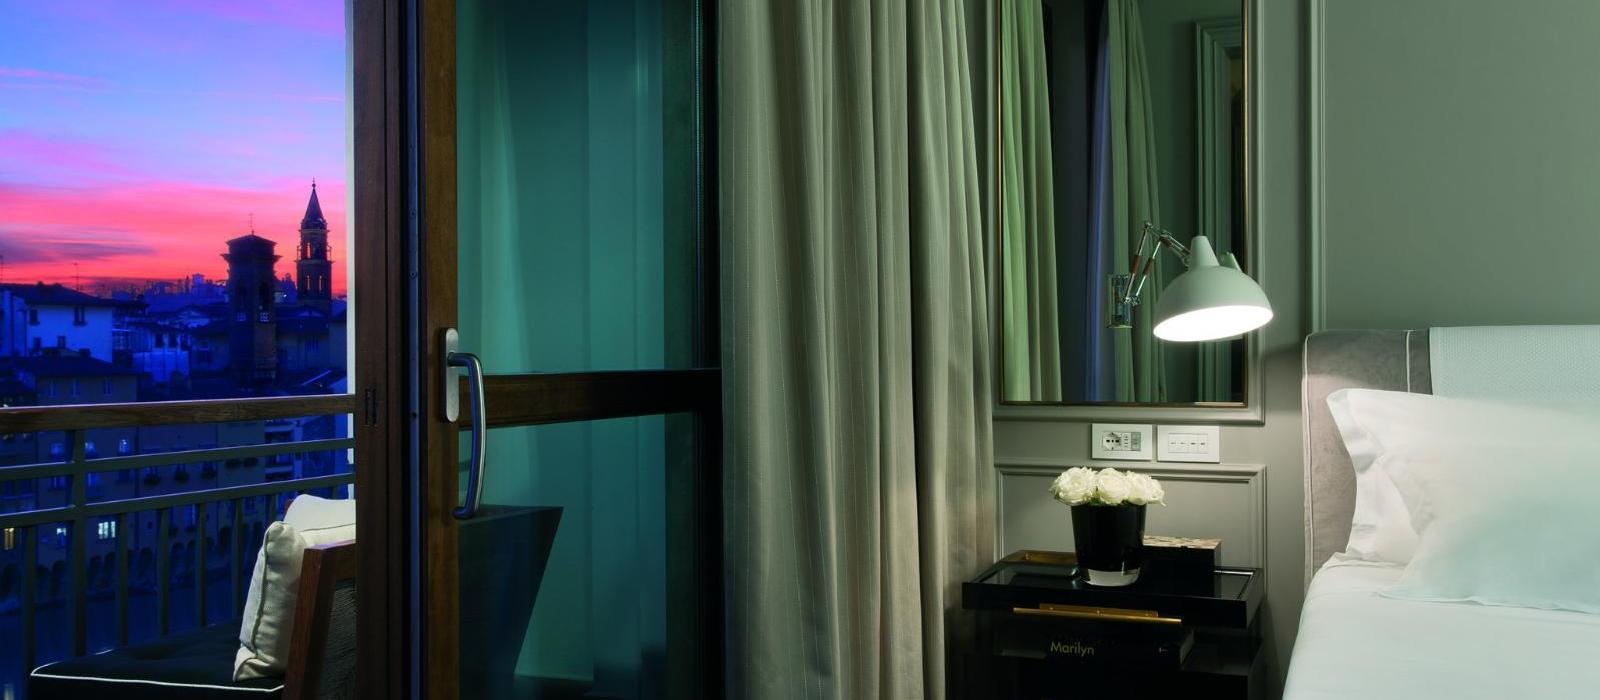 印象佛罗伦萨精品酒店(Portrait Firenze) 图片  www.lhw.cn